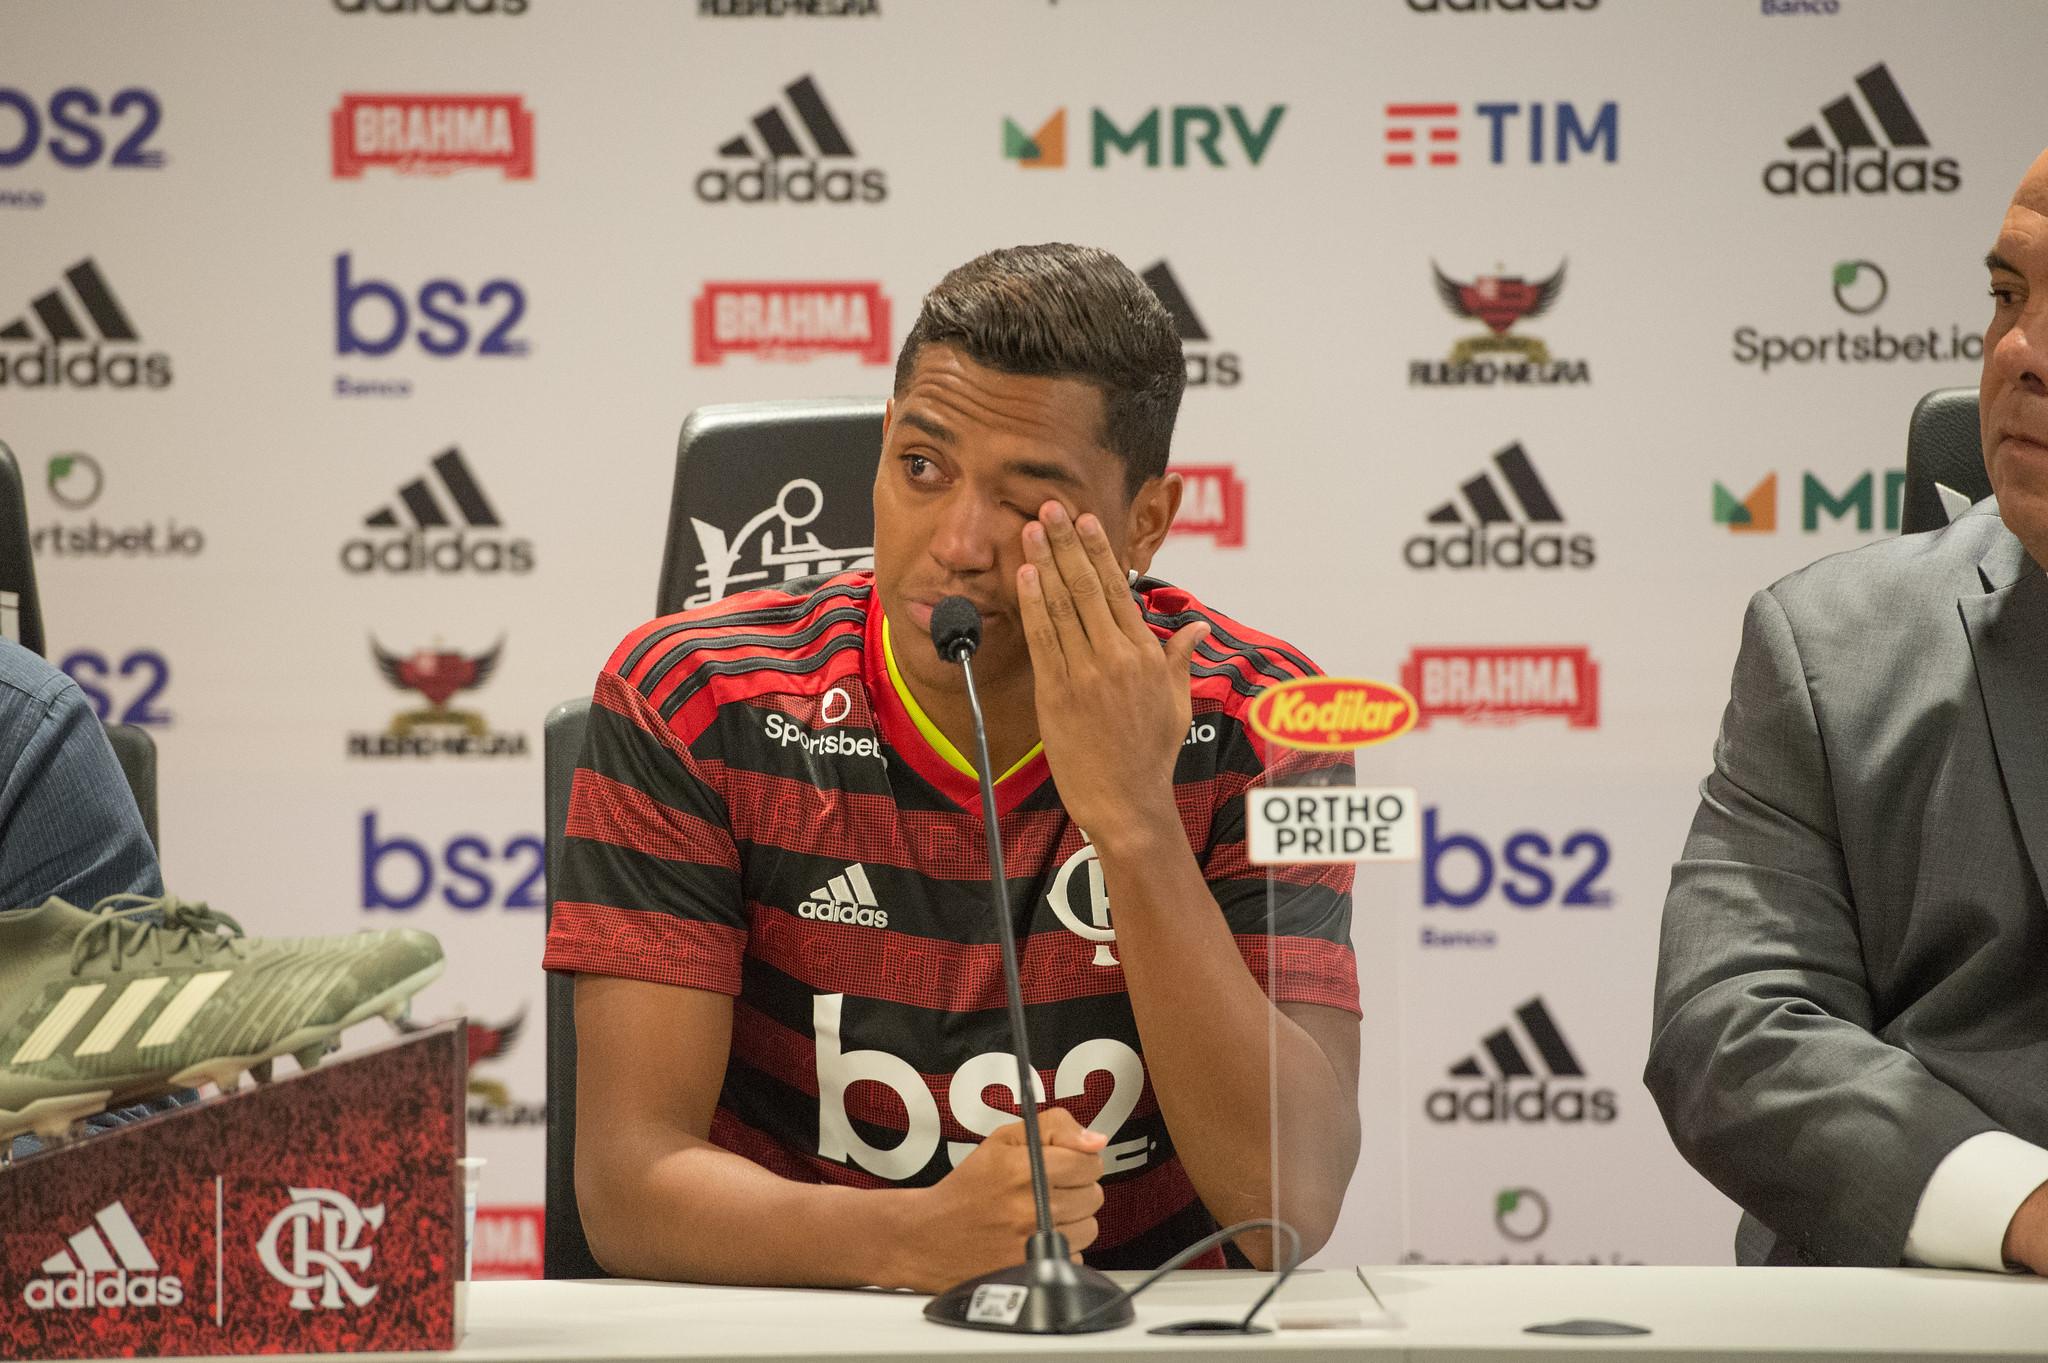 Jogador se emocionou ao falar sobre o novo clube. Foto: Alexandre Vidal/Flamengo